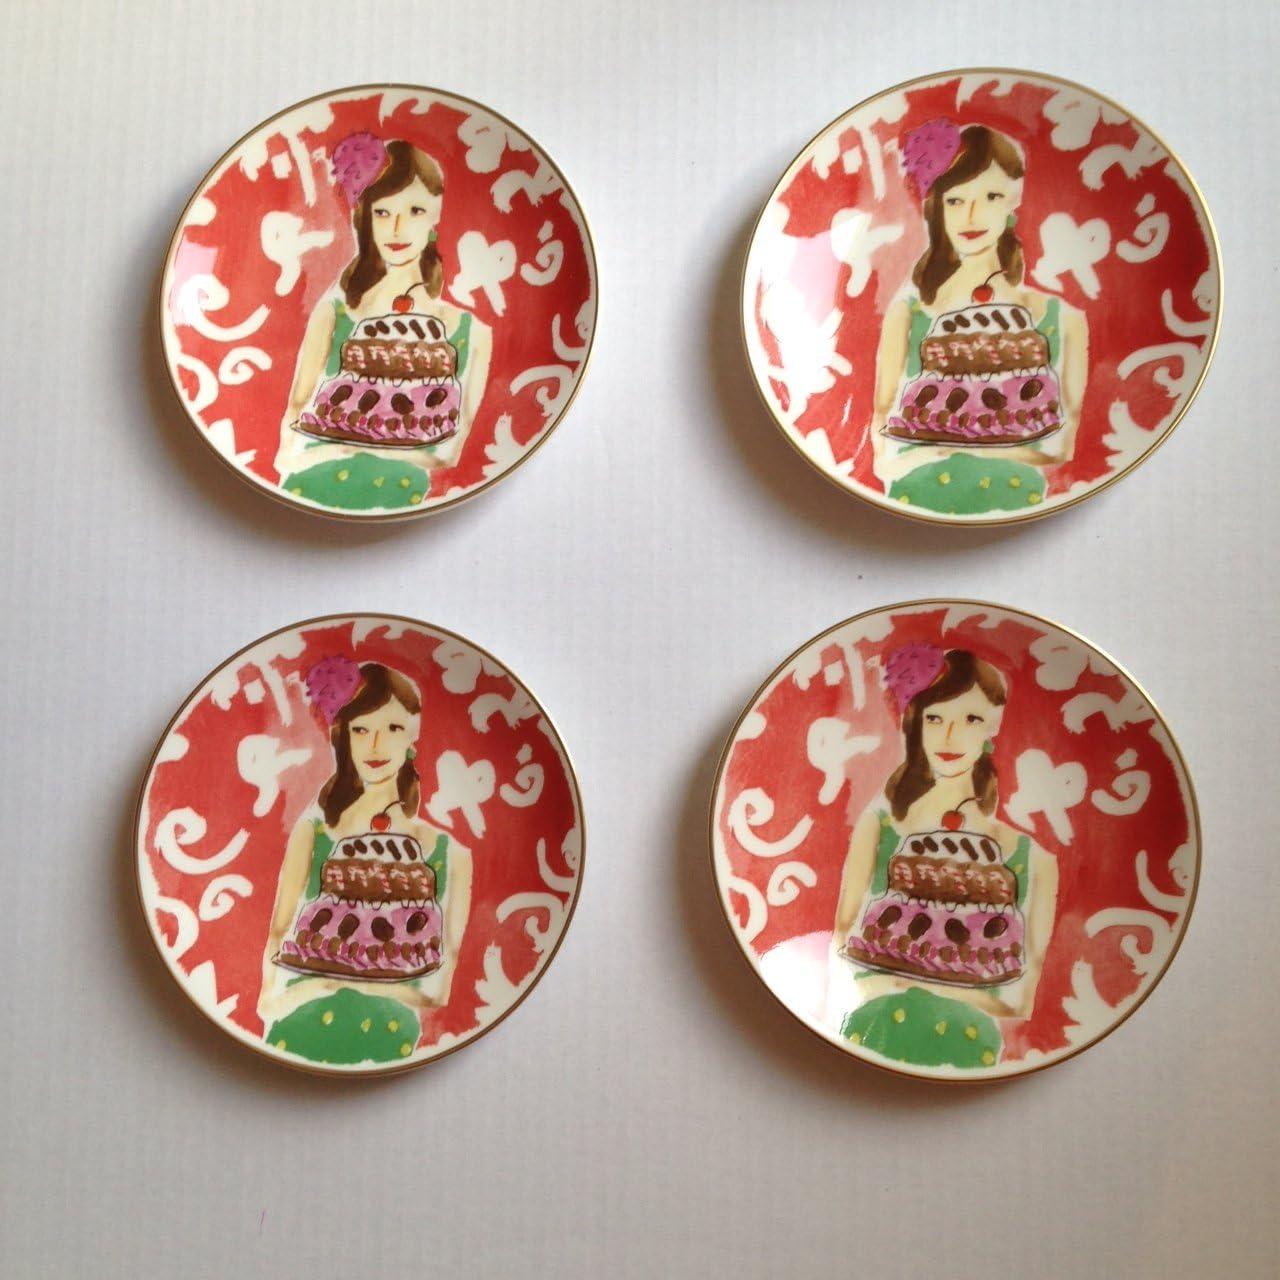 Lenox Illustrated Just Desserts Tidbit Kate Set Spade Max 64% OFF Plates 4 Al sold out.